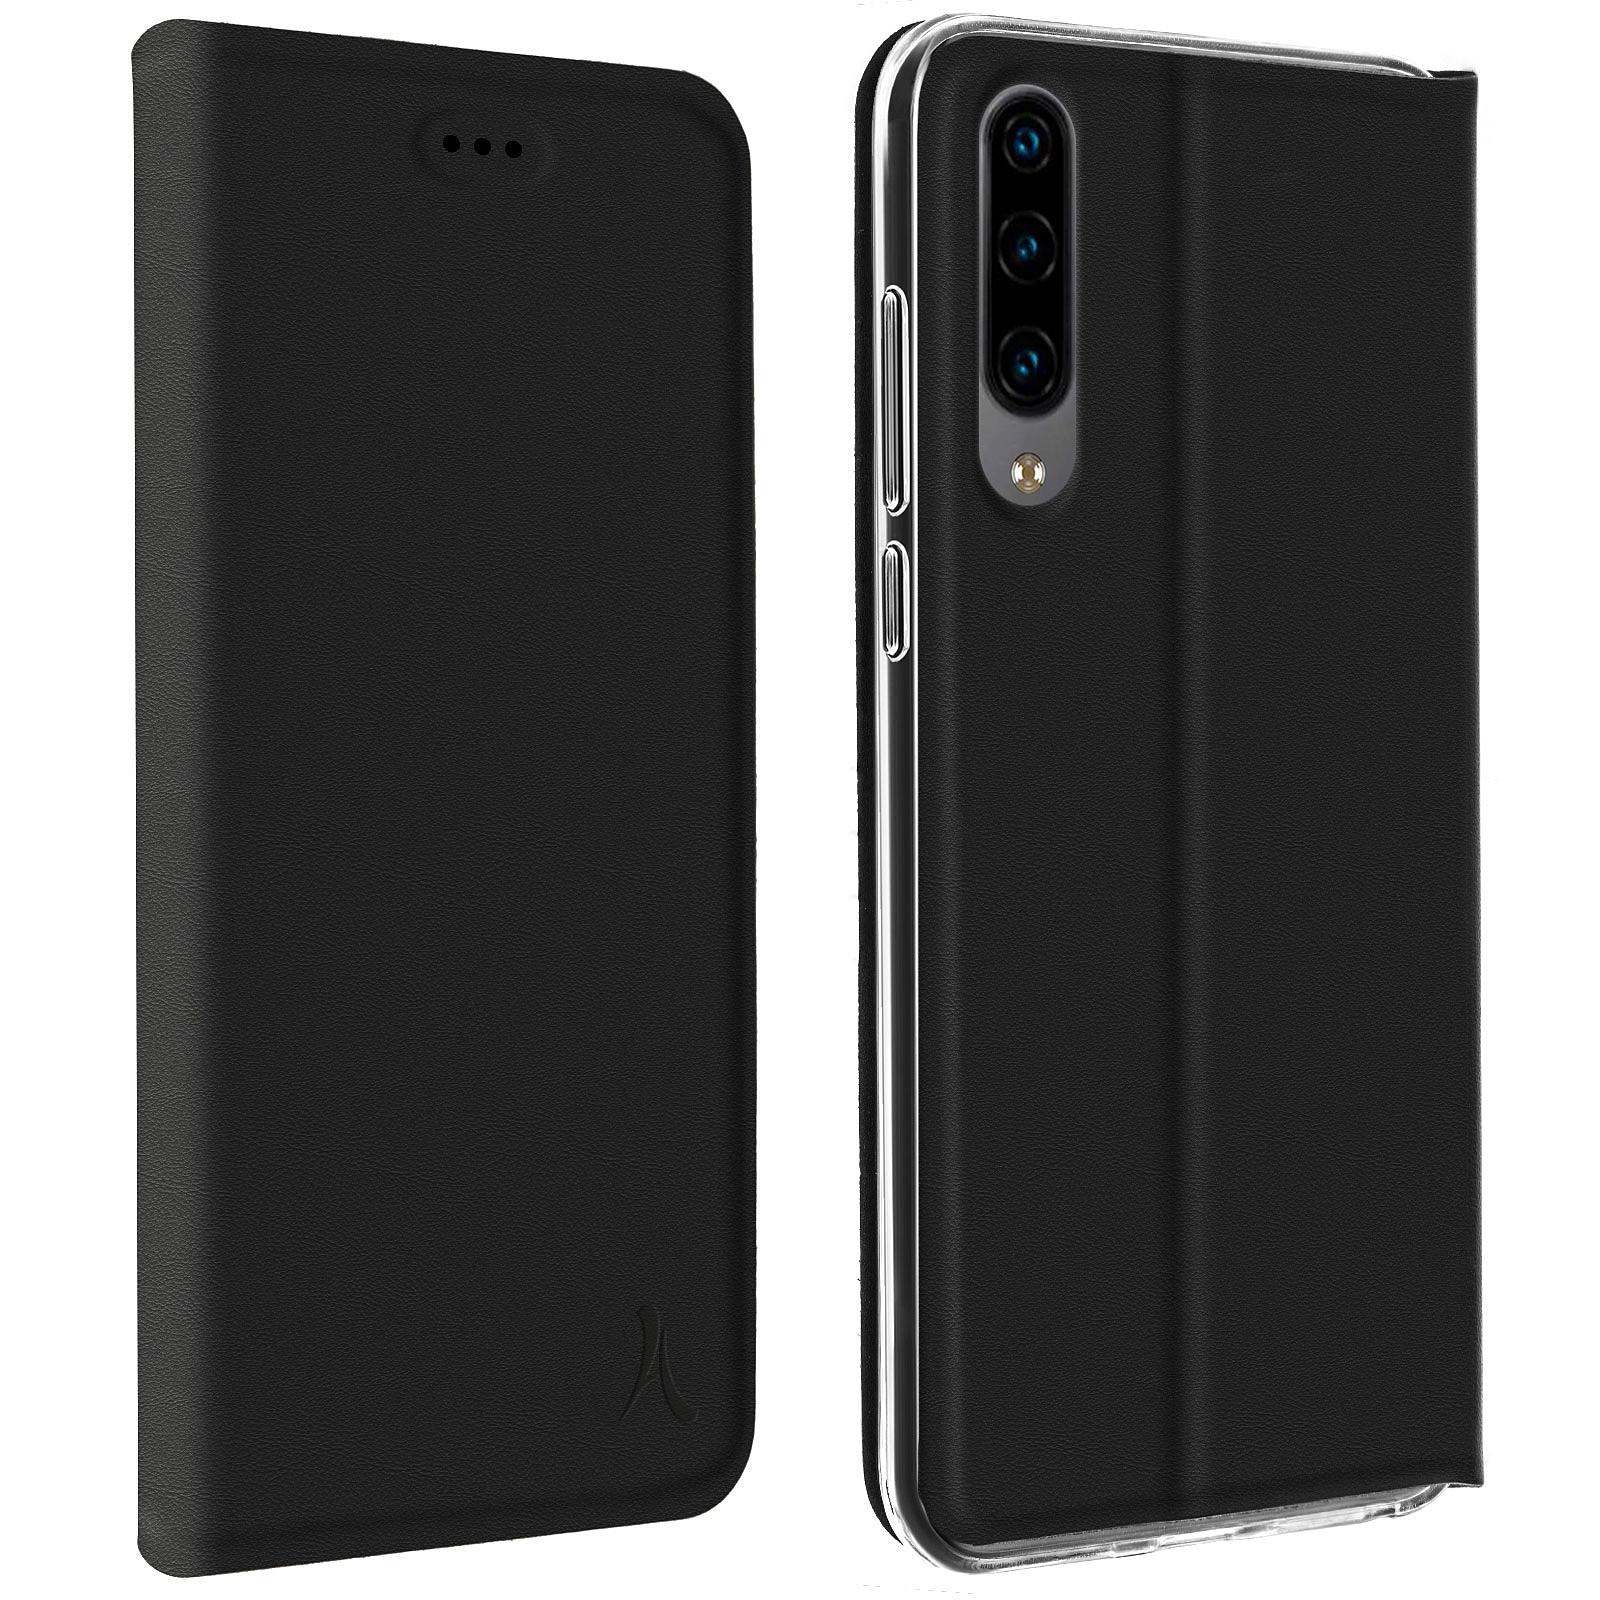 Akashi Etui Folio Porte Carte Noir Huawei P30 Lite